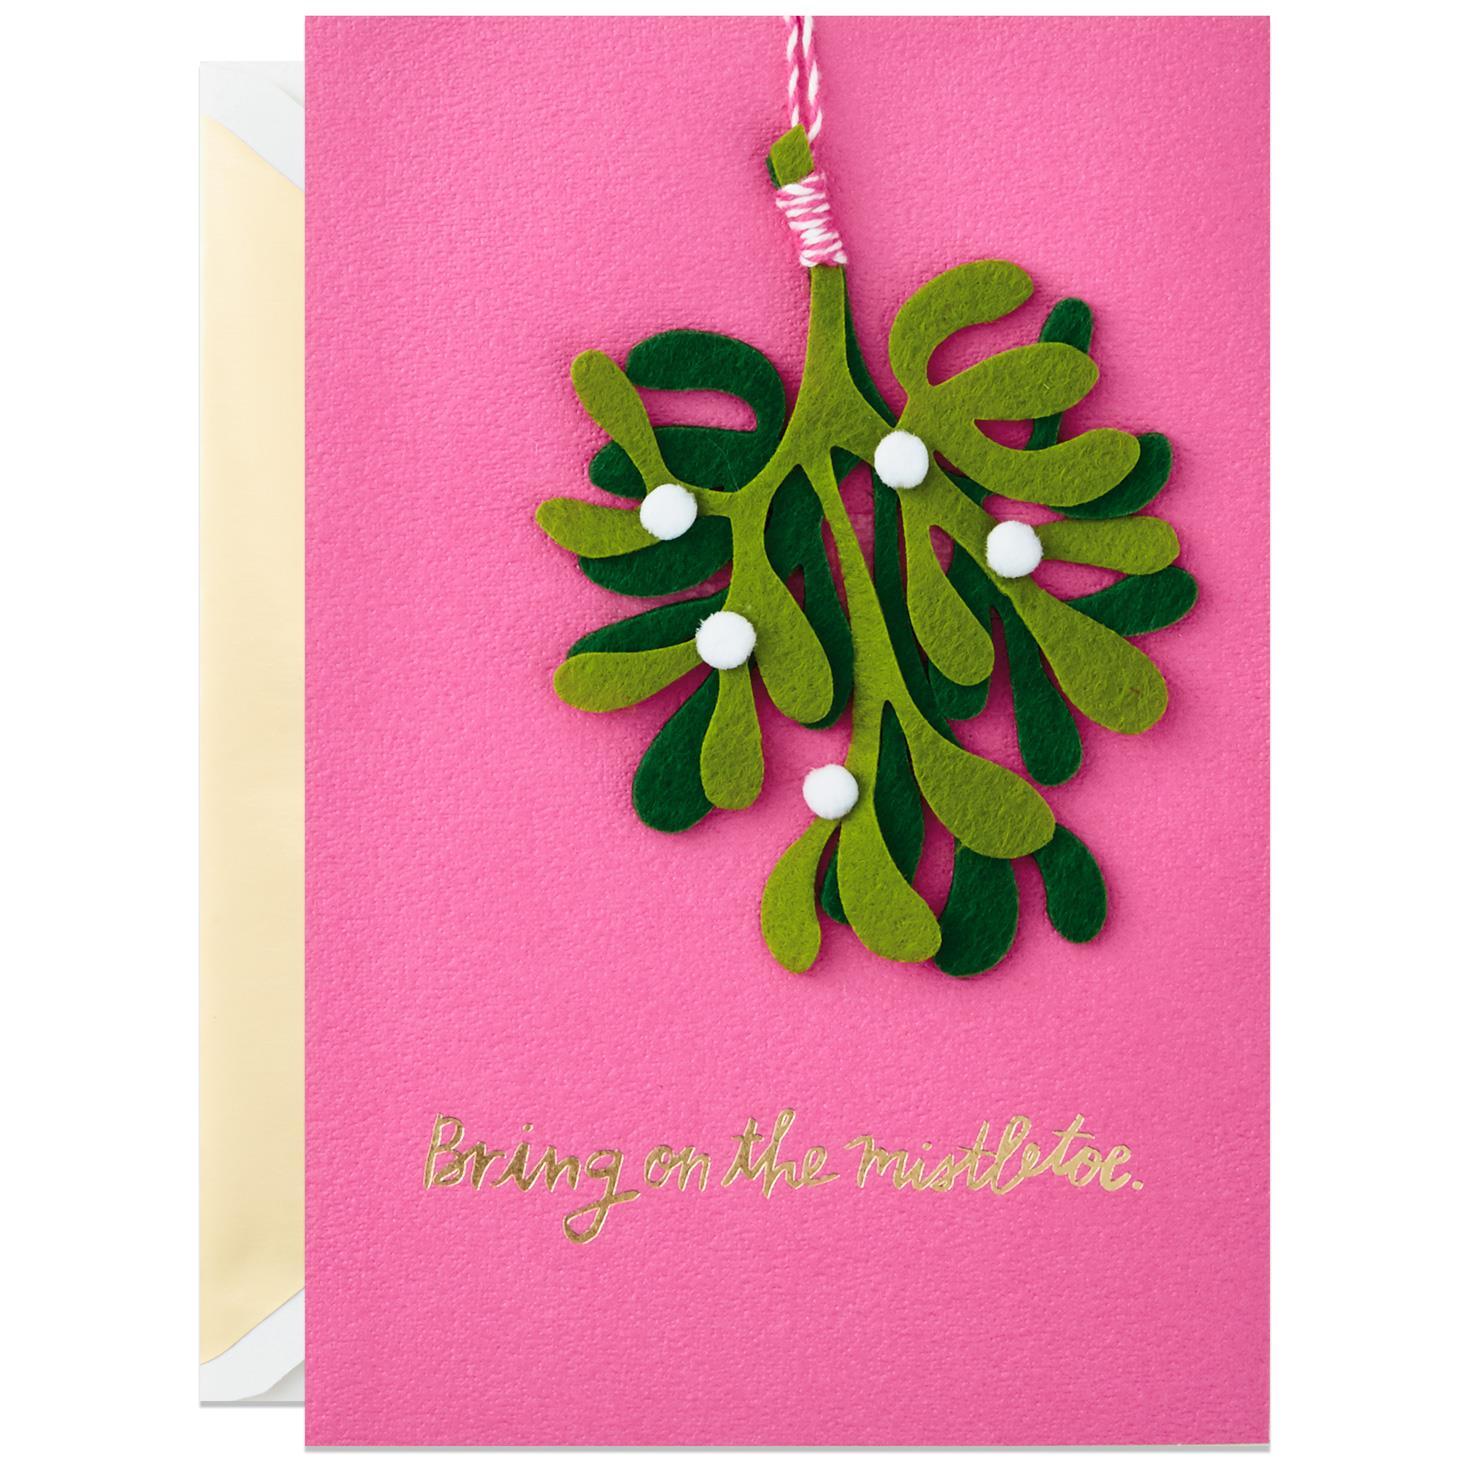 Bring the Mistletoe Christmas Card Greeting Cards Hallmark